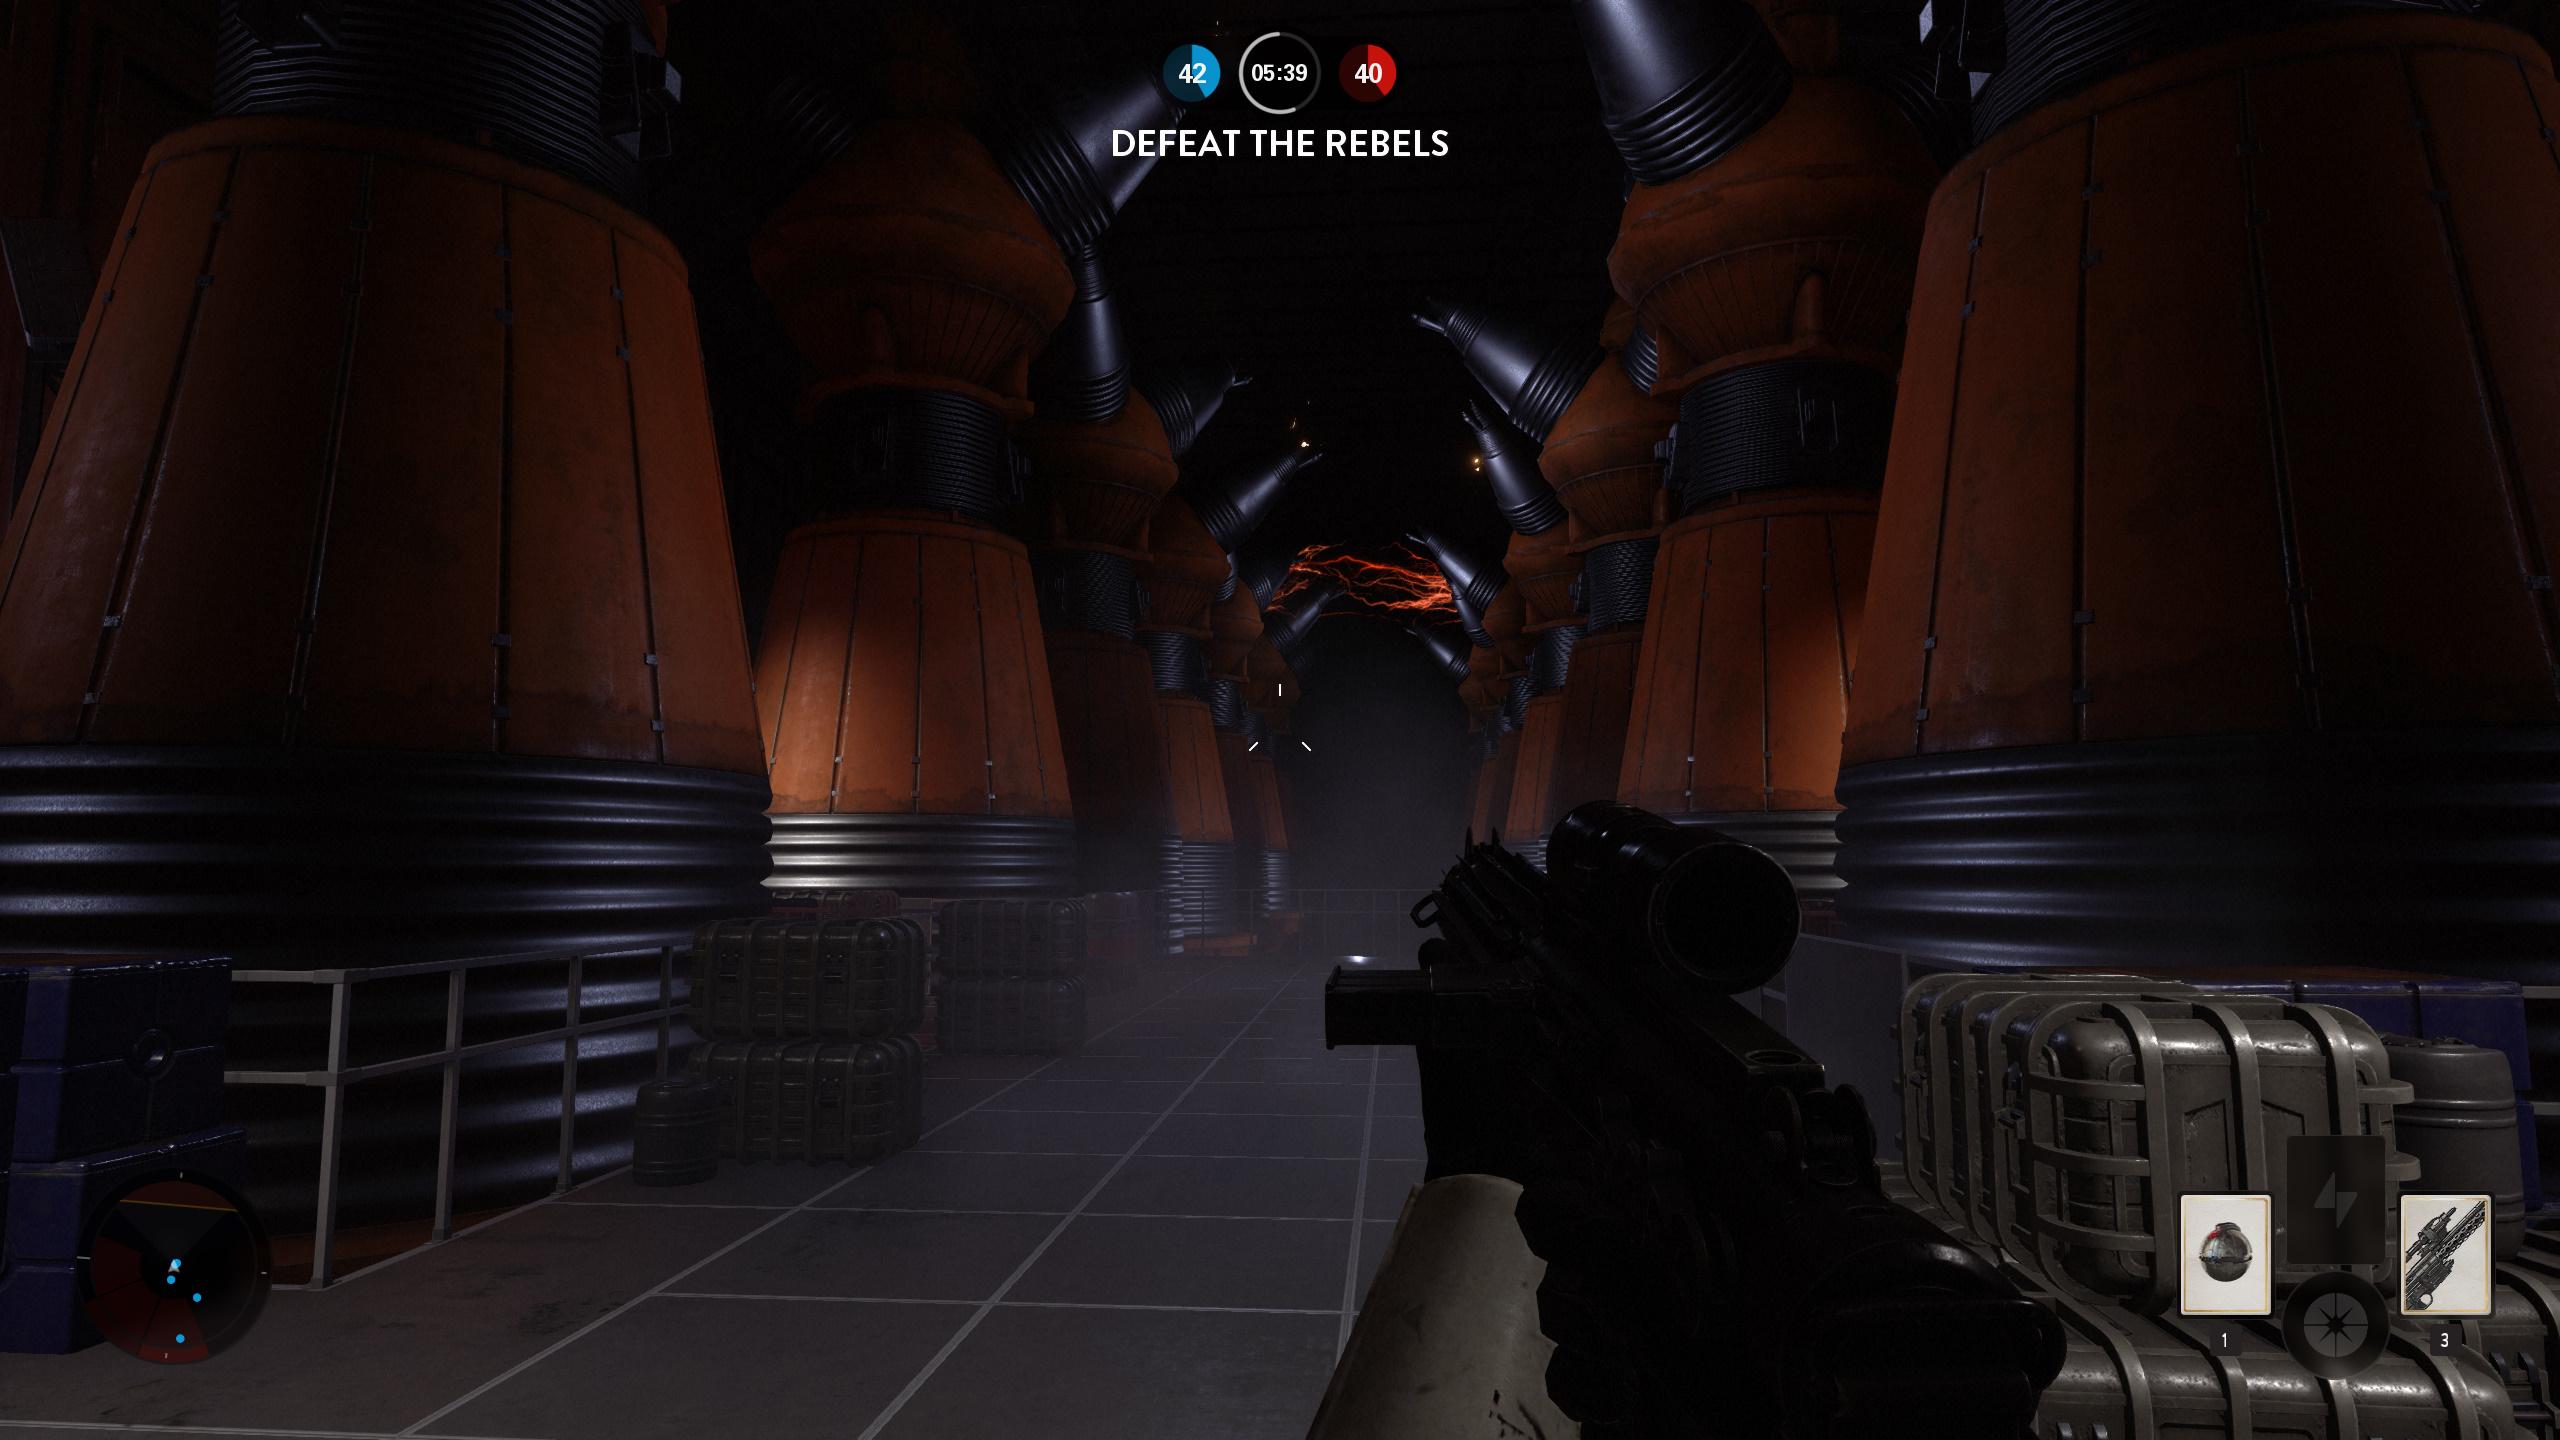 [UPDATED] Patch Notes Inside - Star Wars Battlefront 1.04 ...